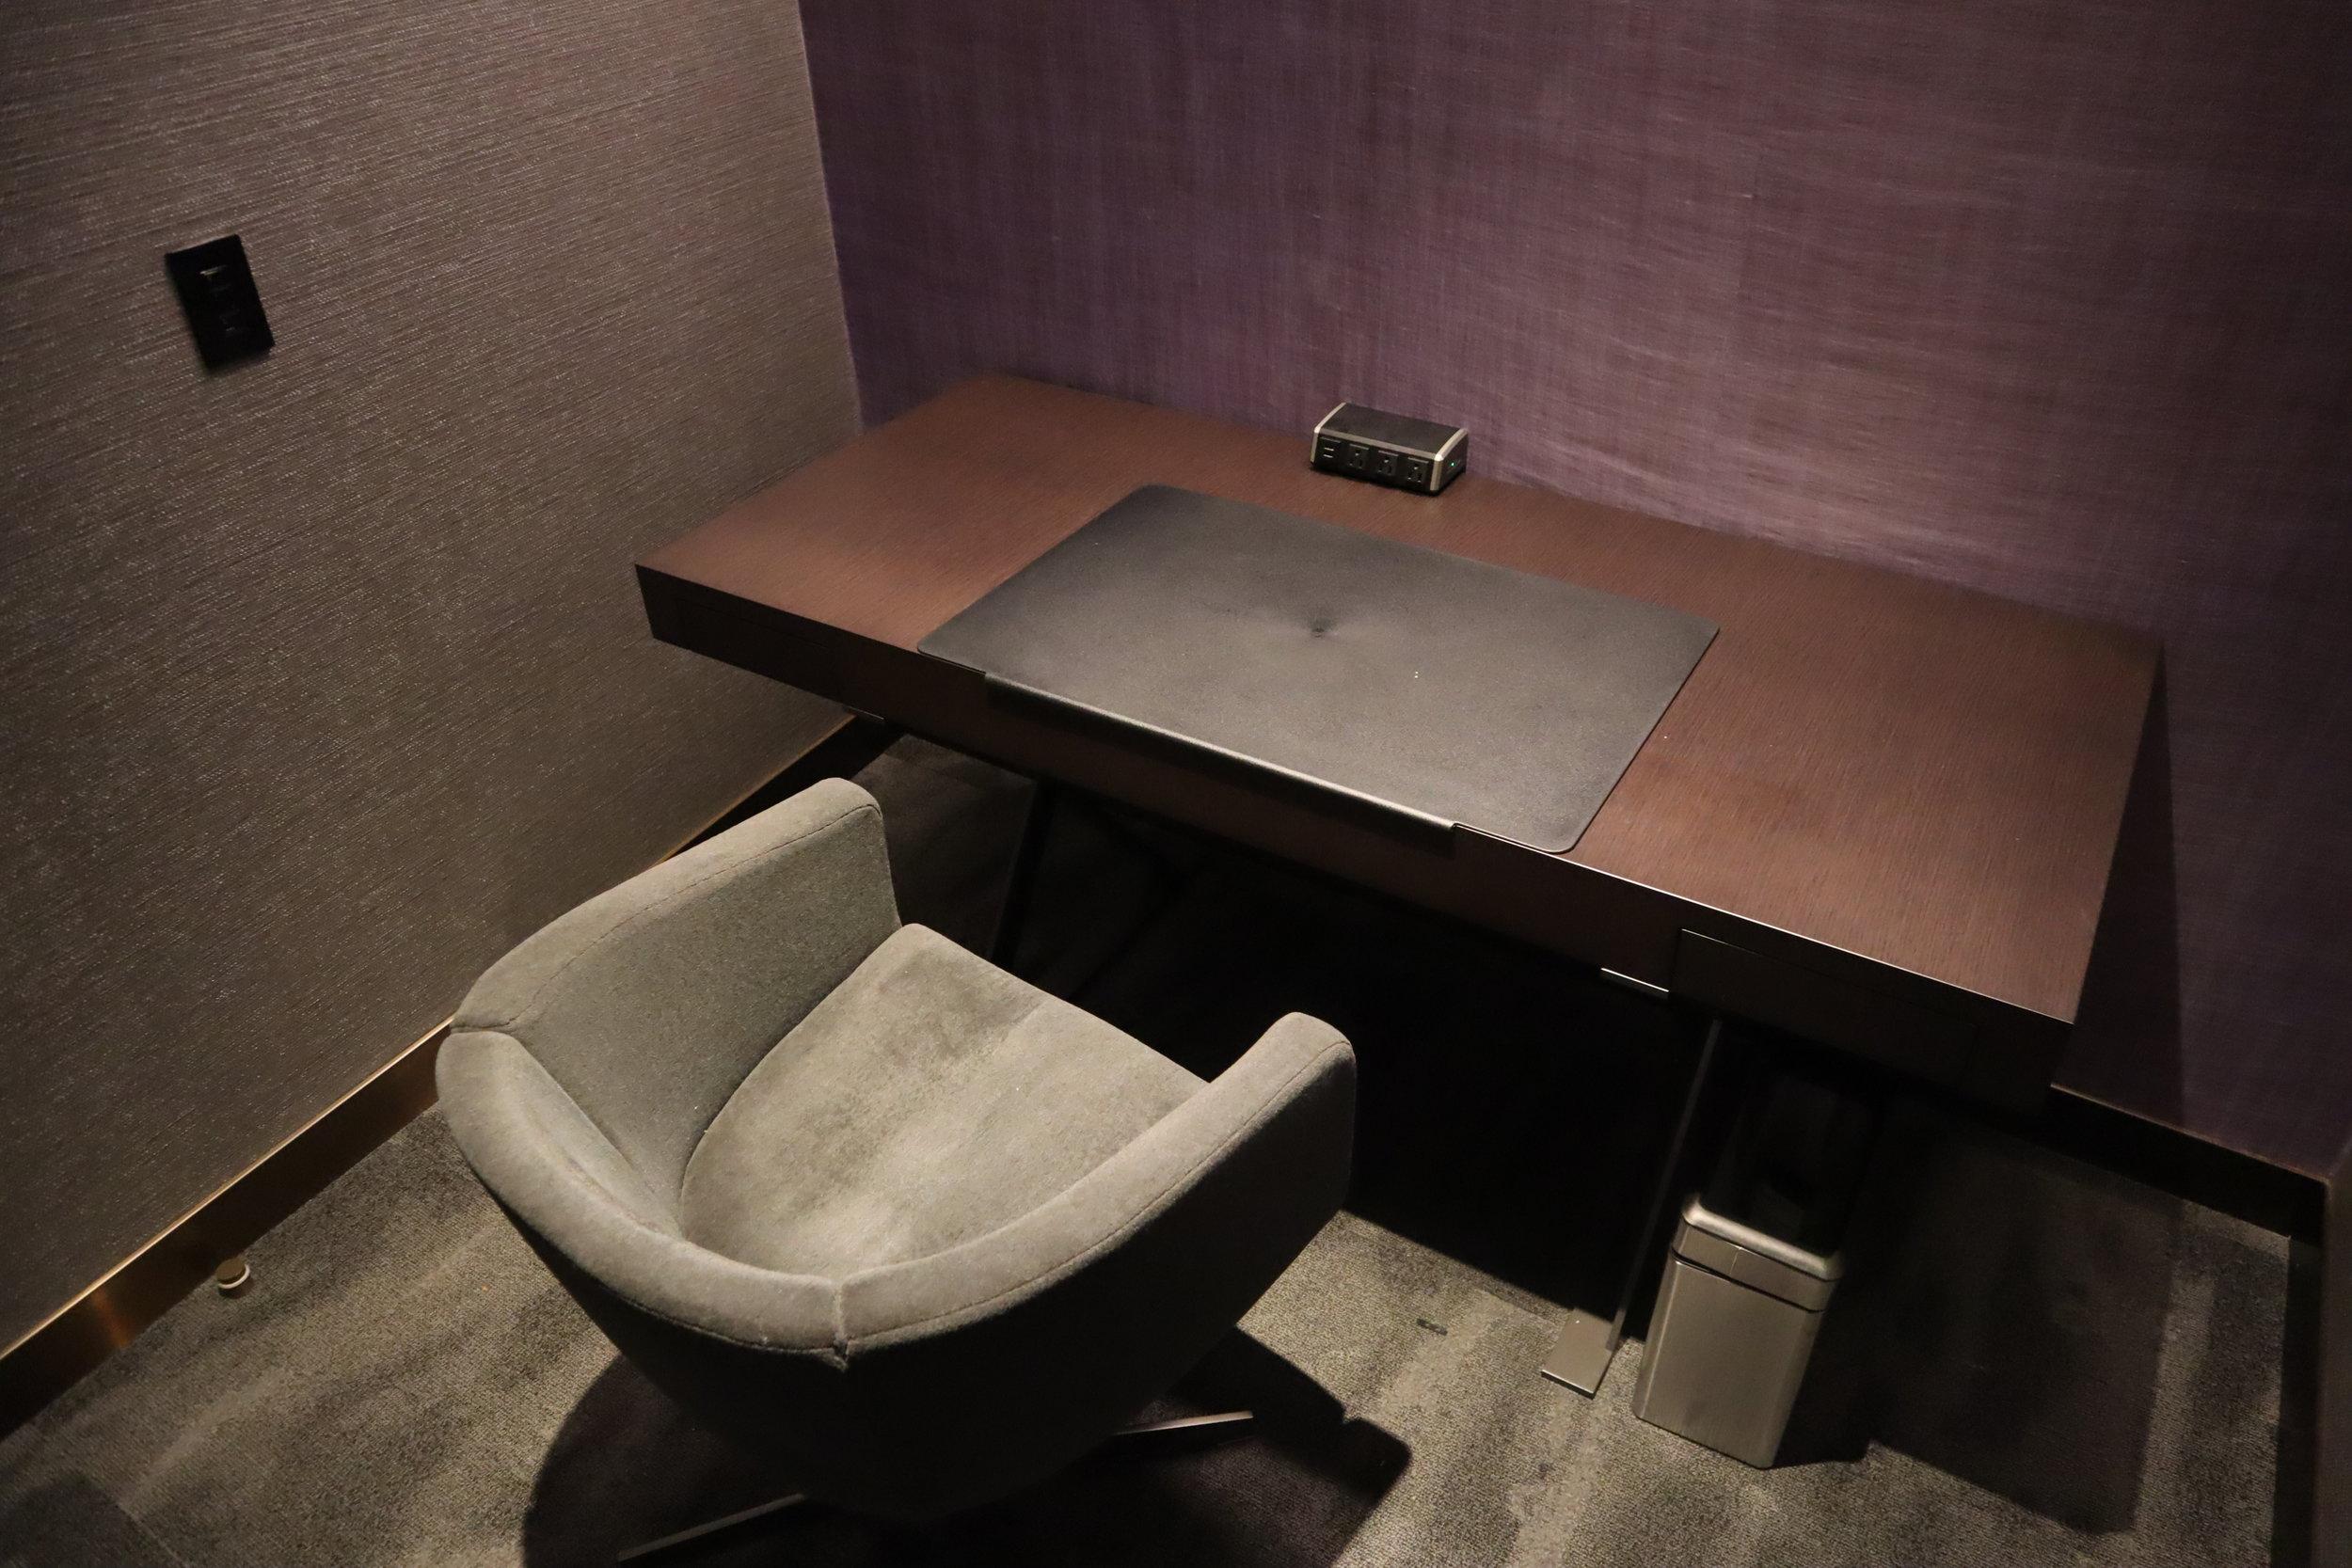 United Polaris Lounge Newark – Phone booth